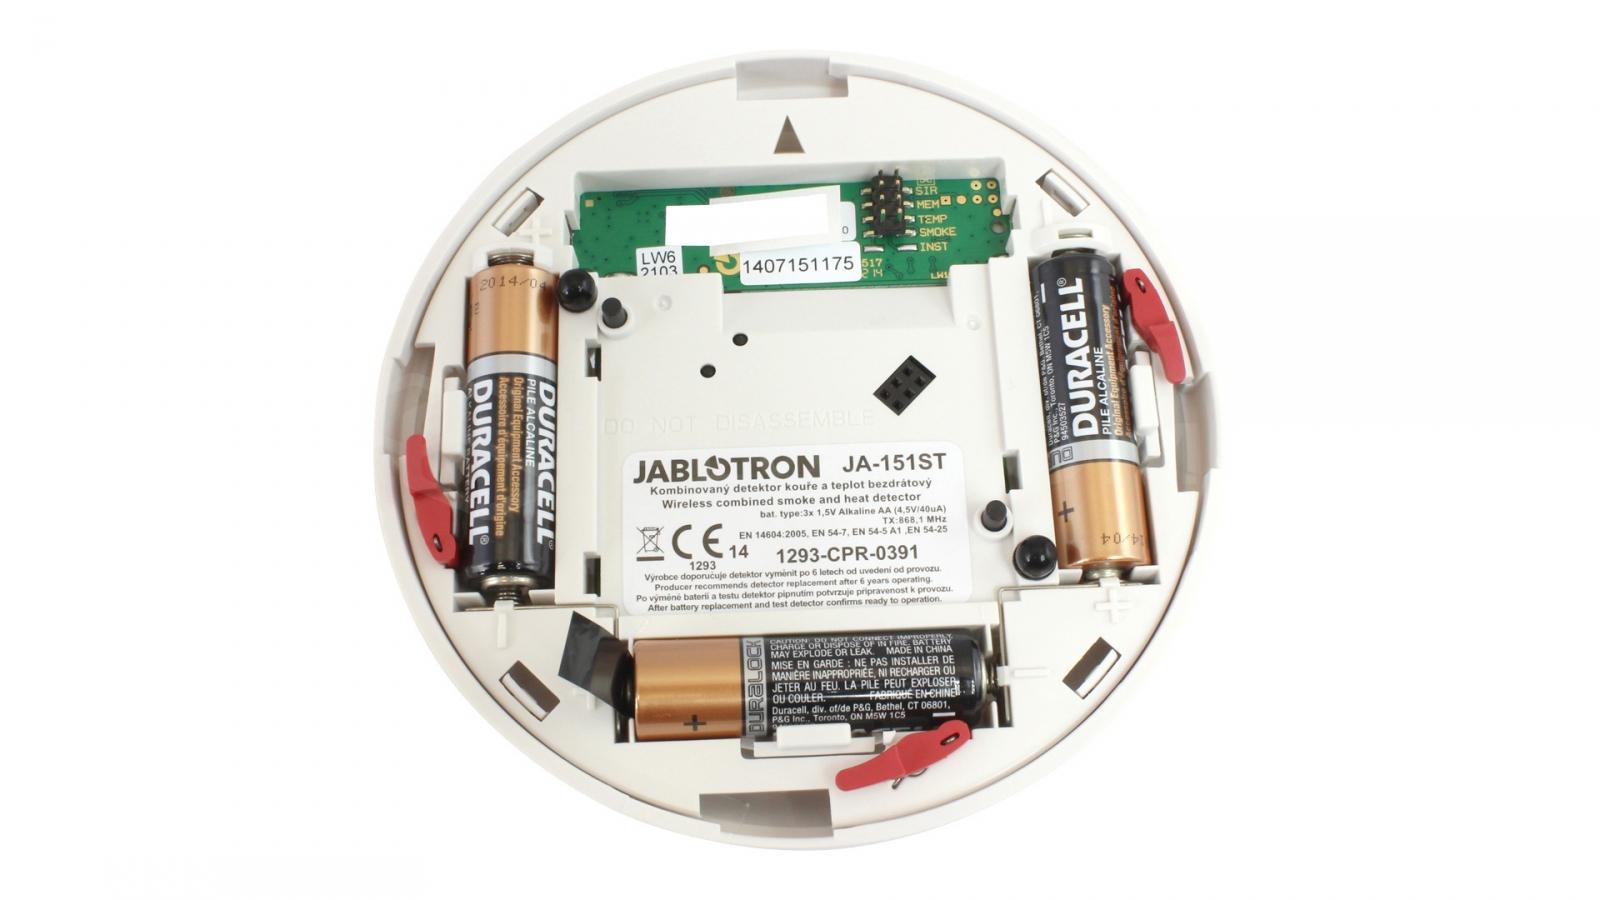 Jablotron Ja 151st Wireless Optical Smoke And Heat Detector